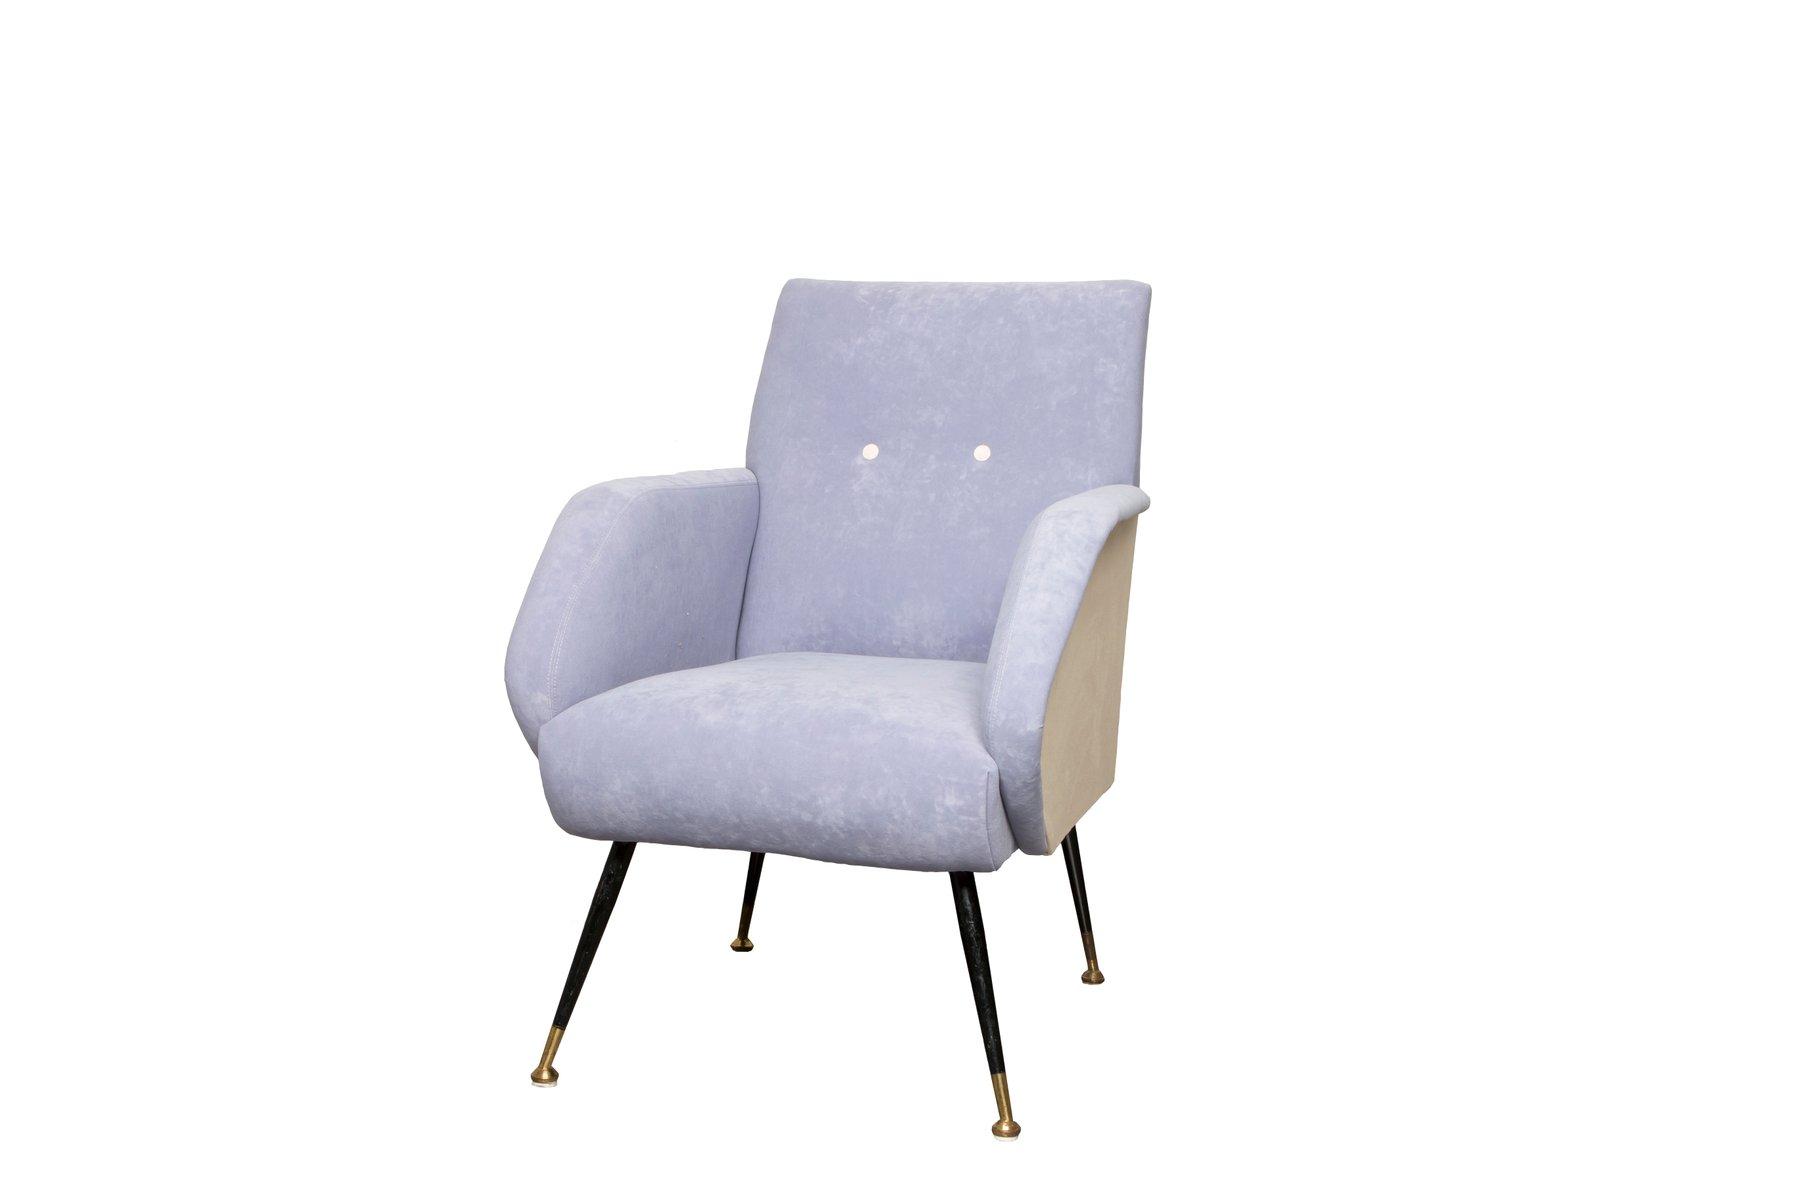 malvenfarbene italienische sessel 1950er 2er set bei pamono kaufen. Black Bedroom Furniture Sets. Home Design Ideas